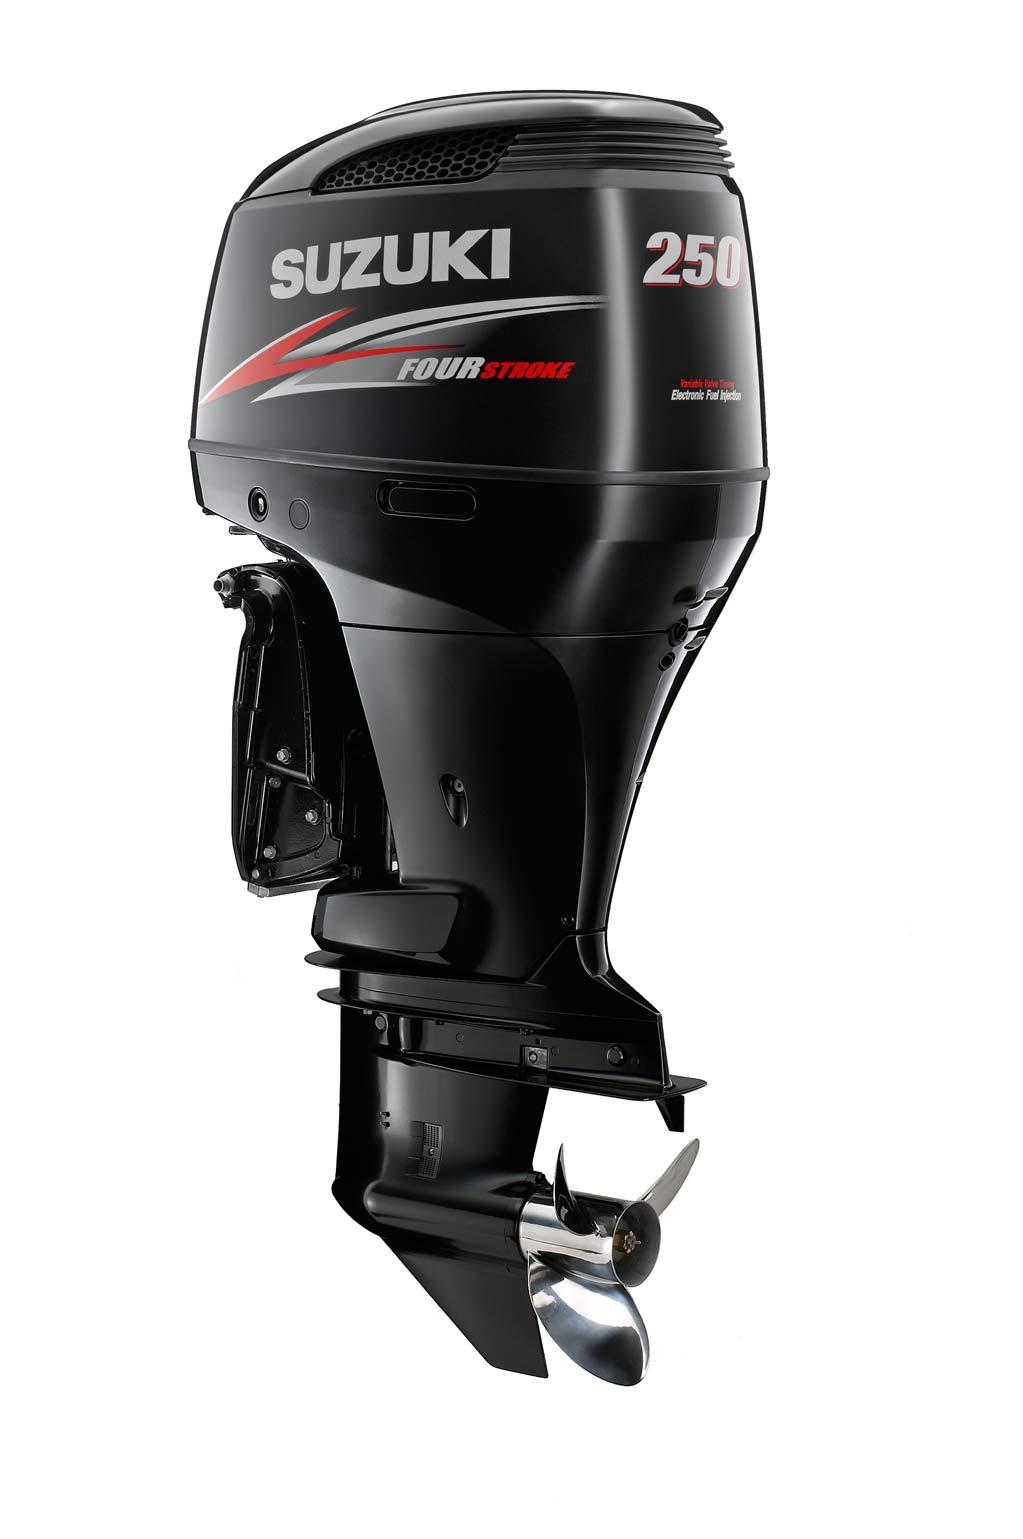 lodochnyj-motor-suzuki-df-250-zxx-chetyrekhtaktnyj-250-l-s-suzuki_enl